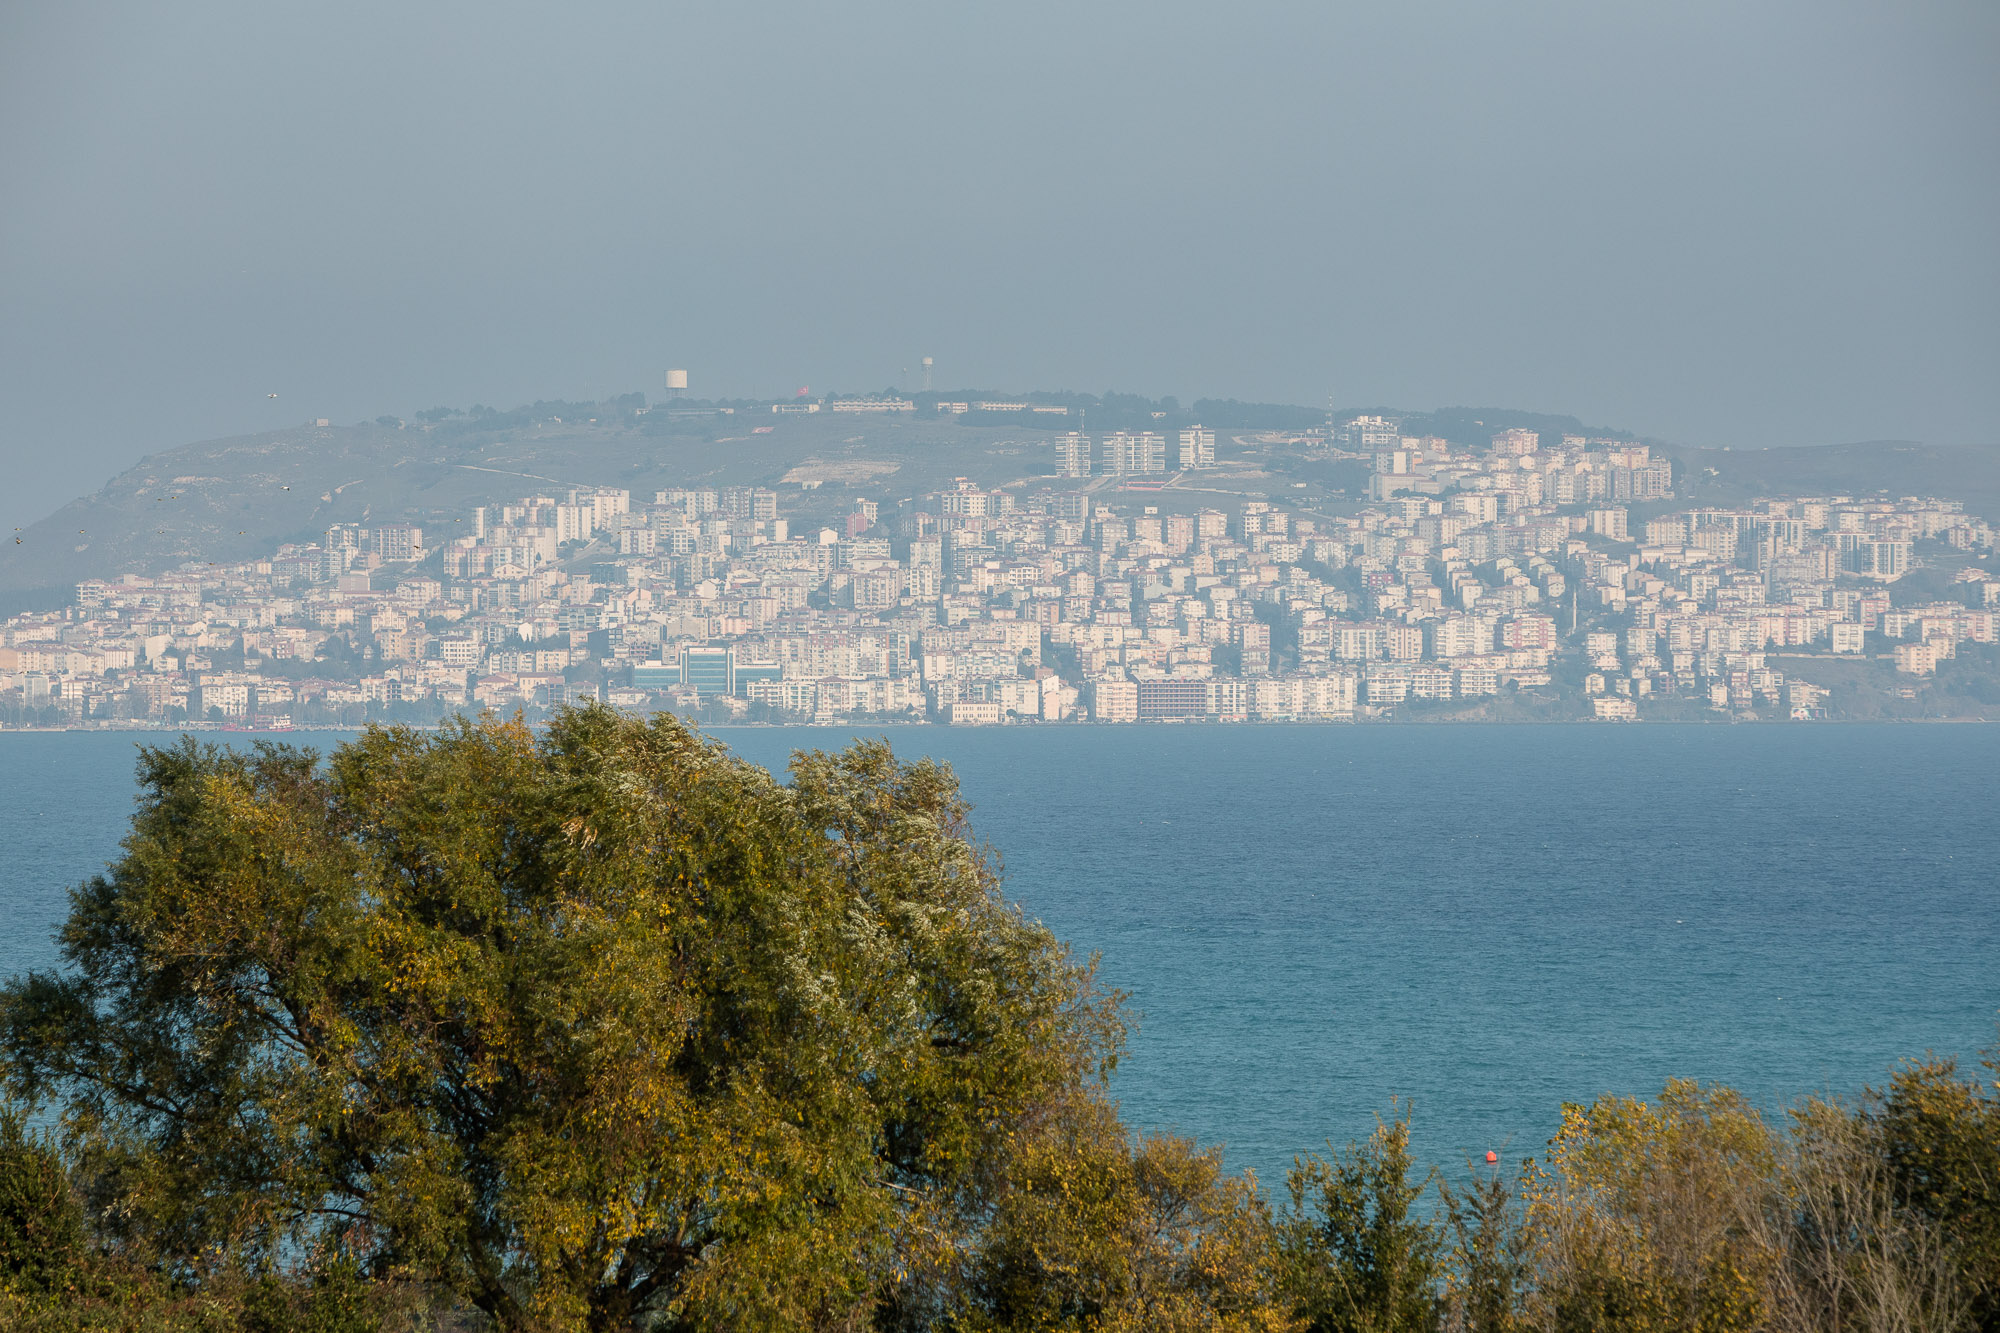 Sinop from afar